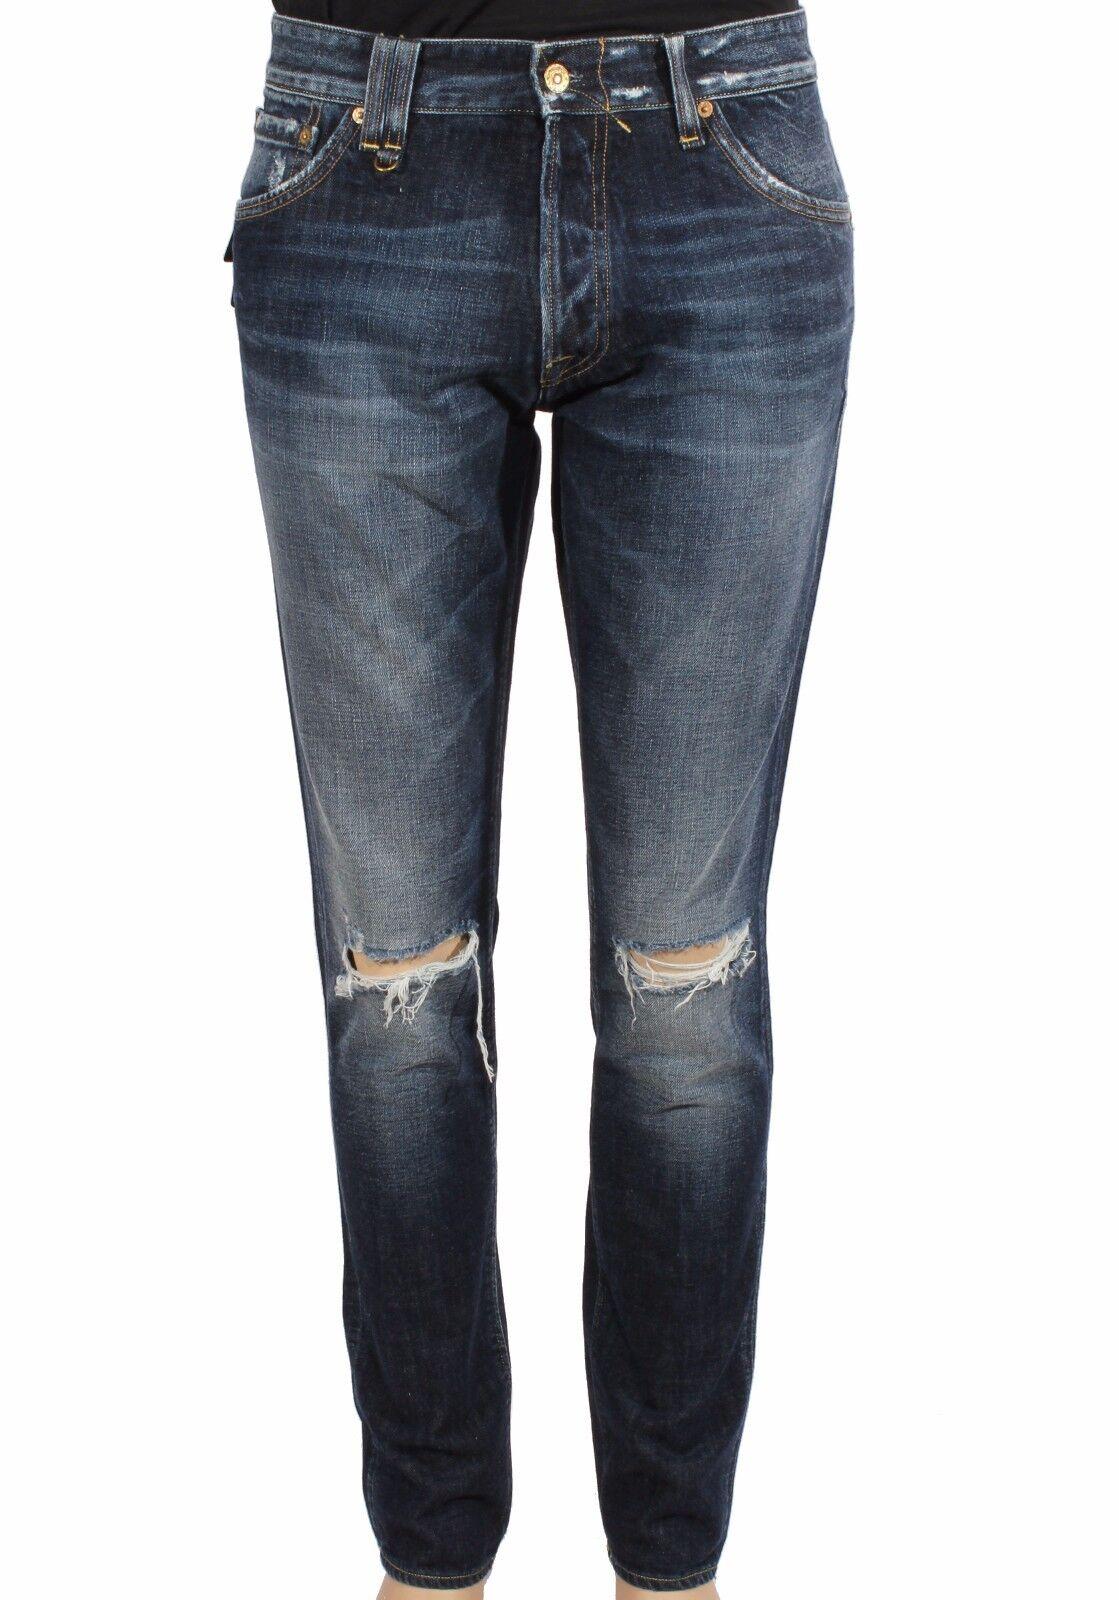 Men's Jeans CYCLE MPT170 D1079 2881 Denim Cotton 11OZ Real Indigo LIST PRICE